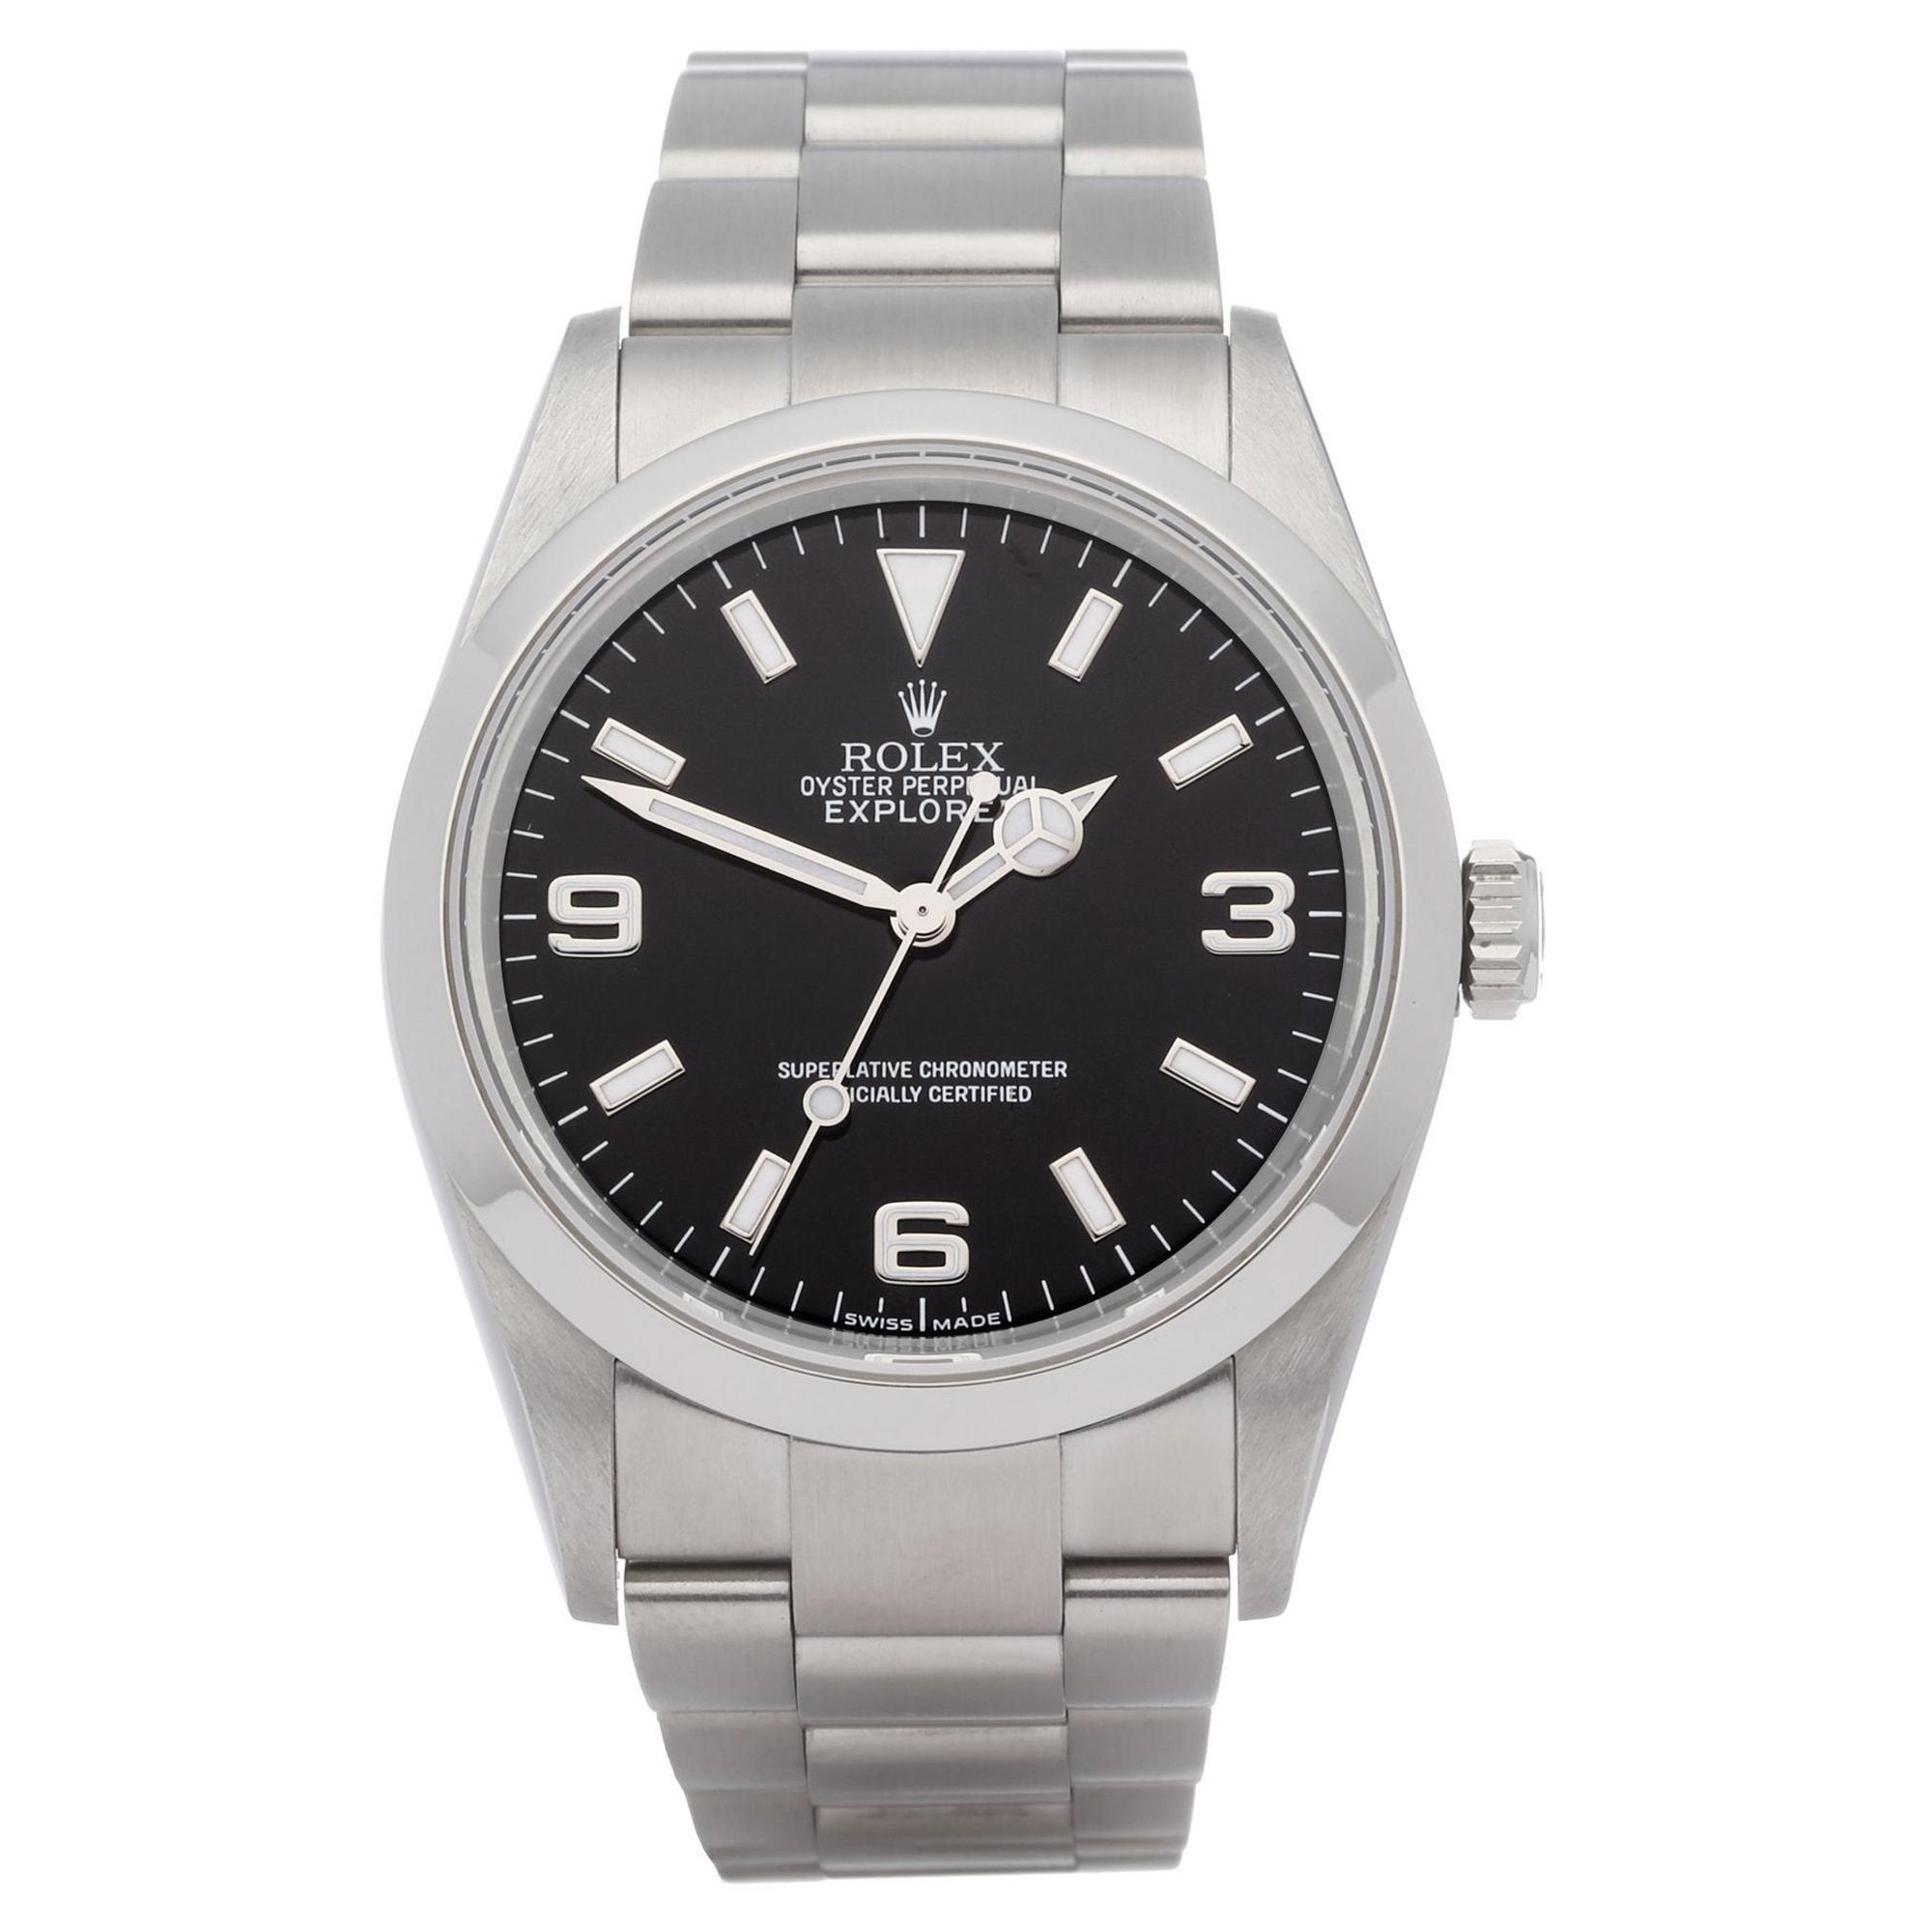 Rolex Explorer 0 114270 Men Stainless Steel 'Engraved Rehaut' Watch